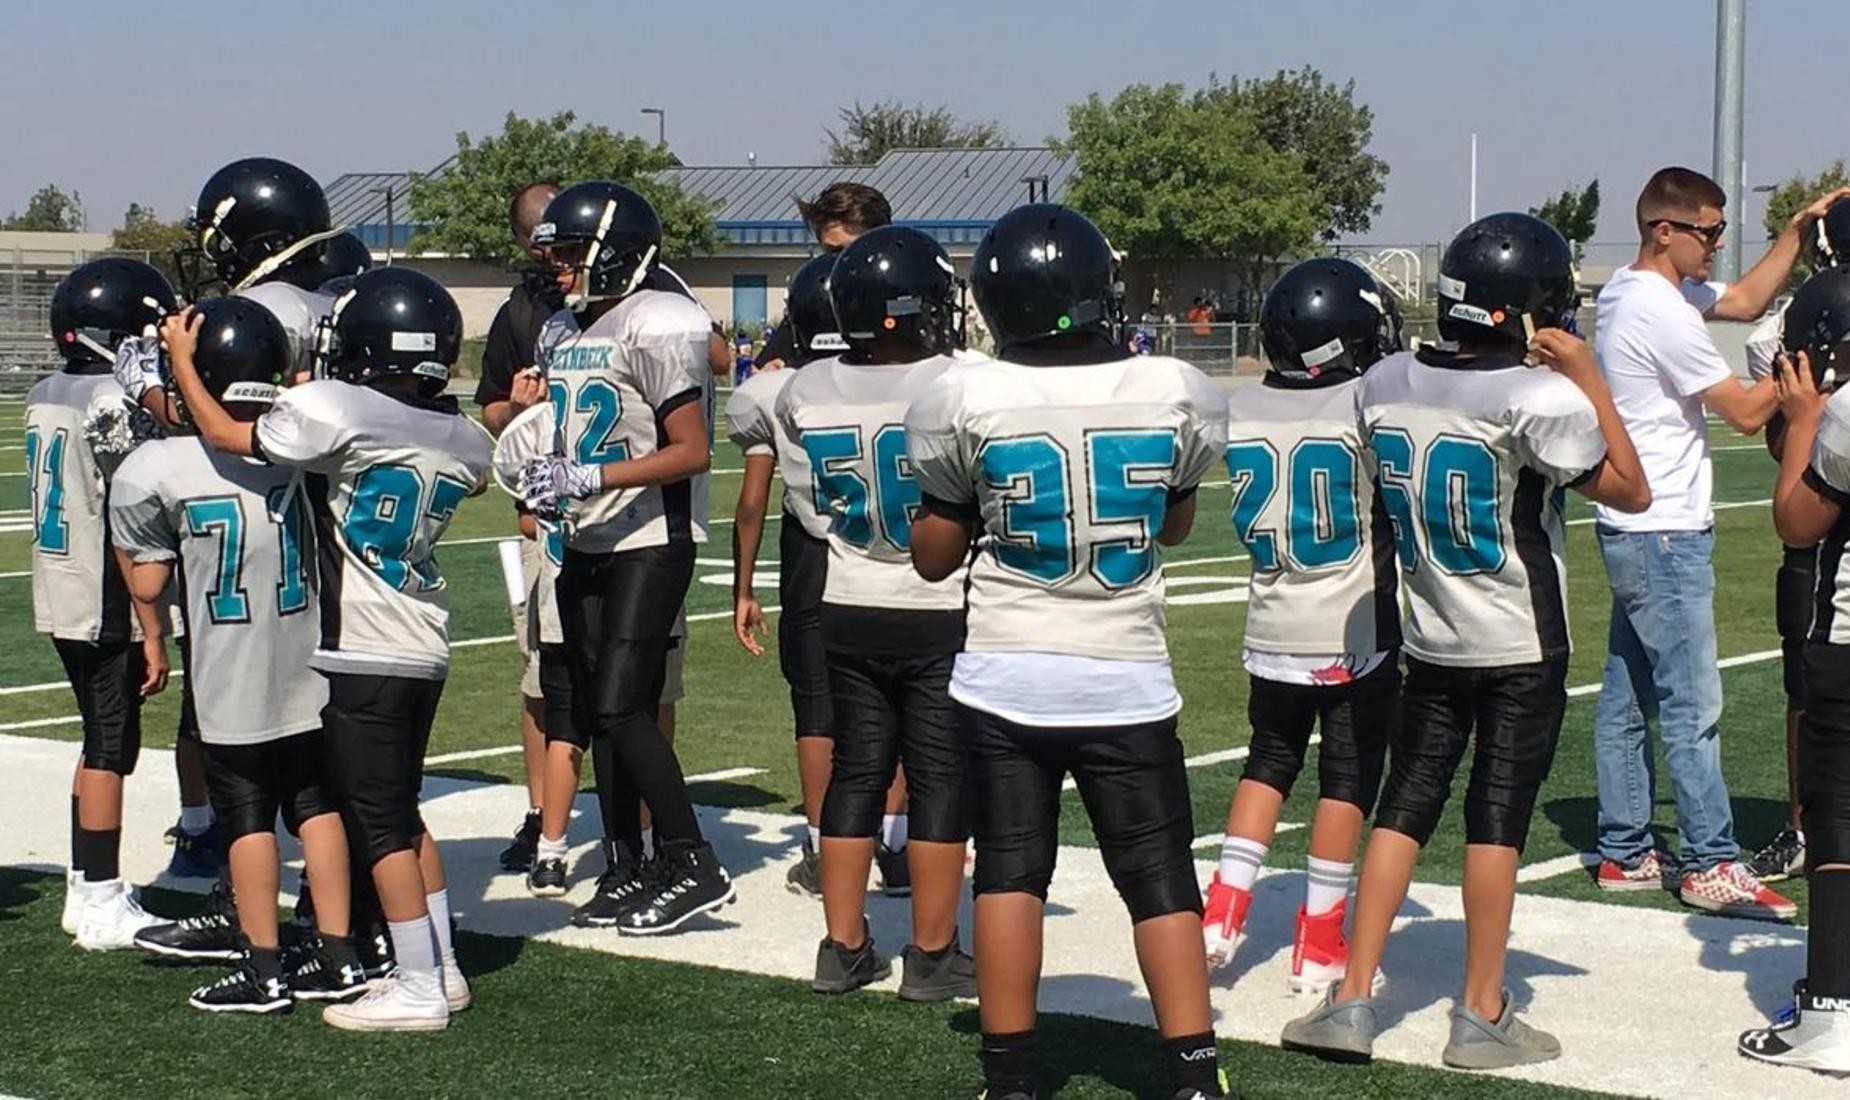 The Steinbeck Sharks football team